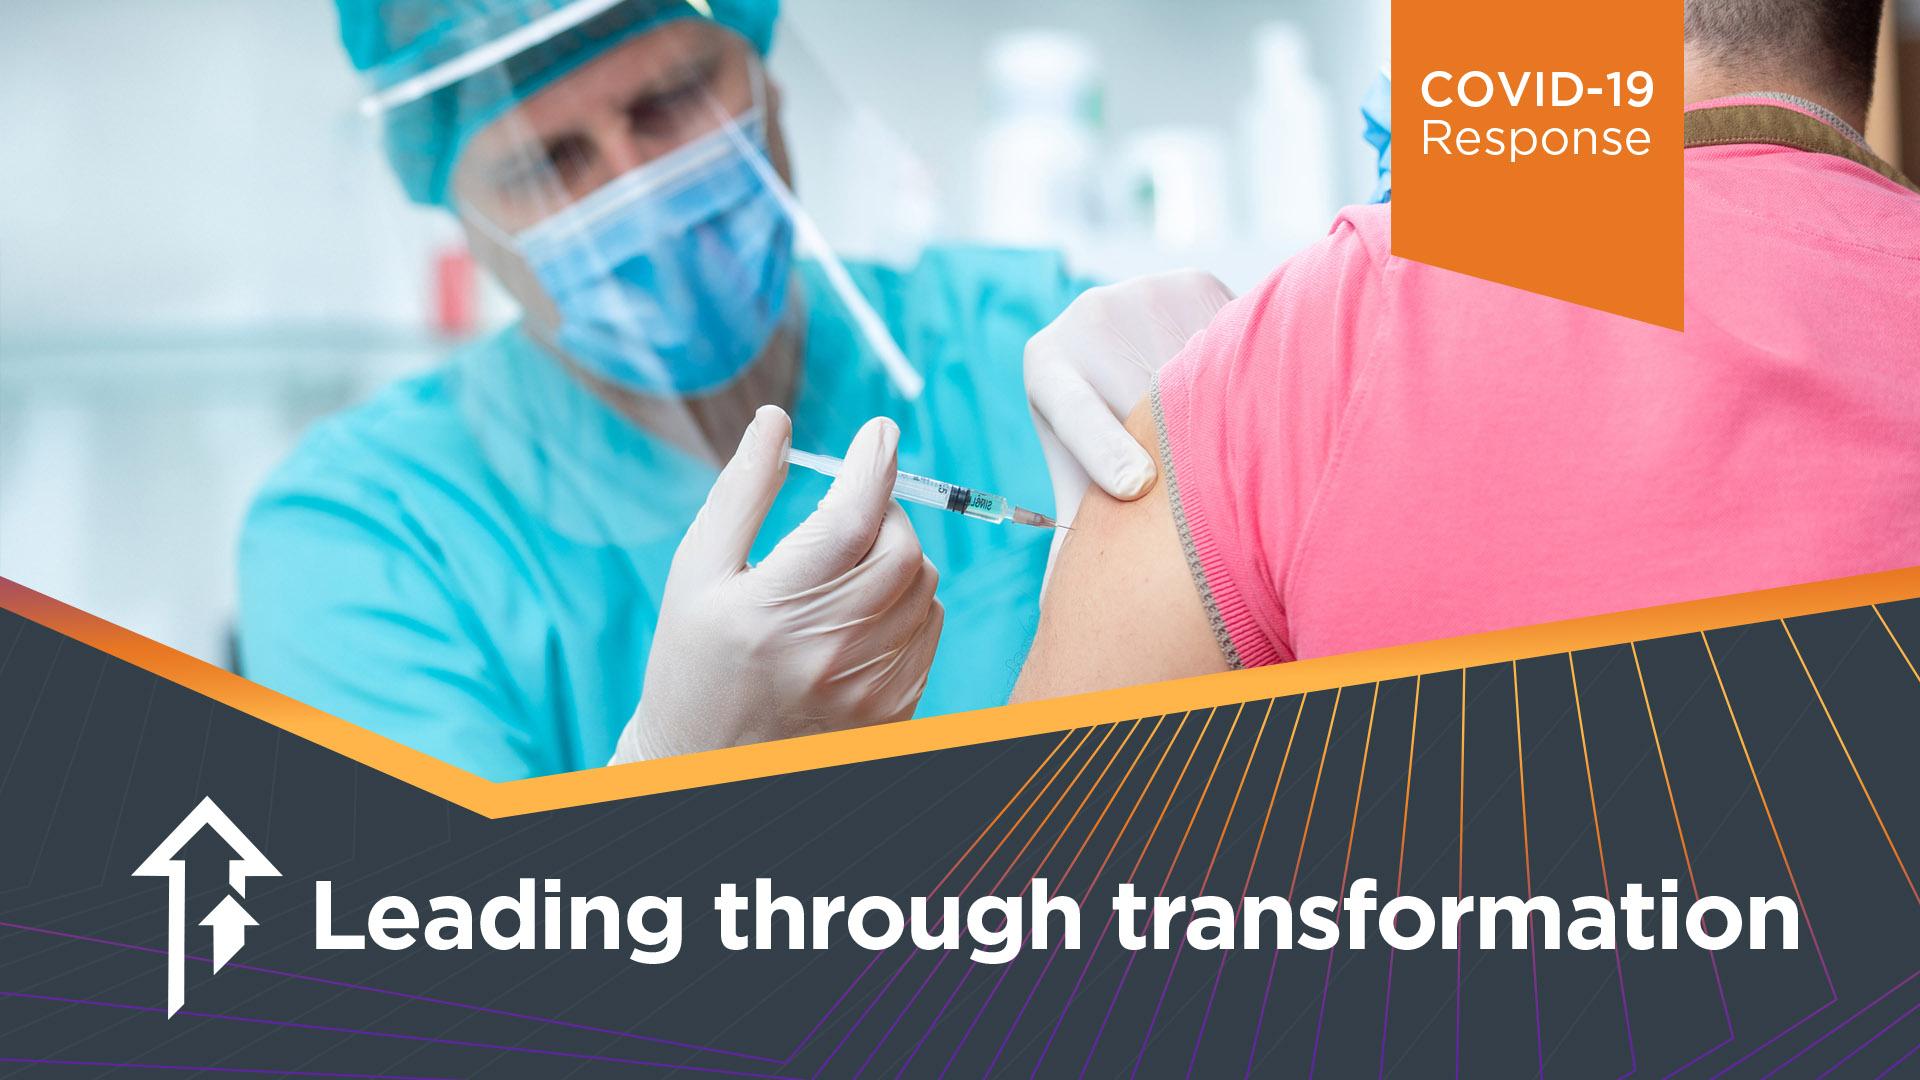 COVID-19 Response Leading through transformation